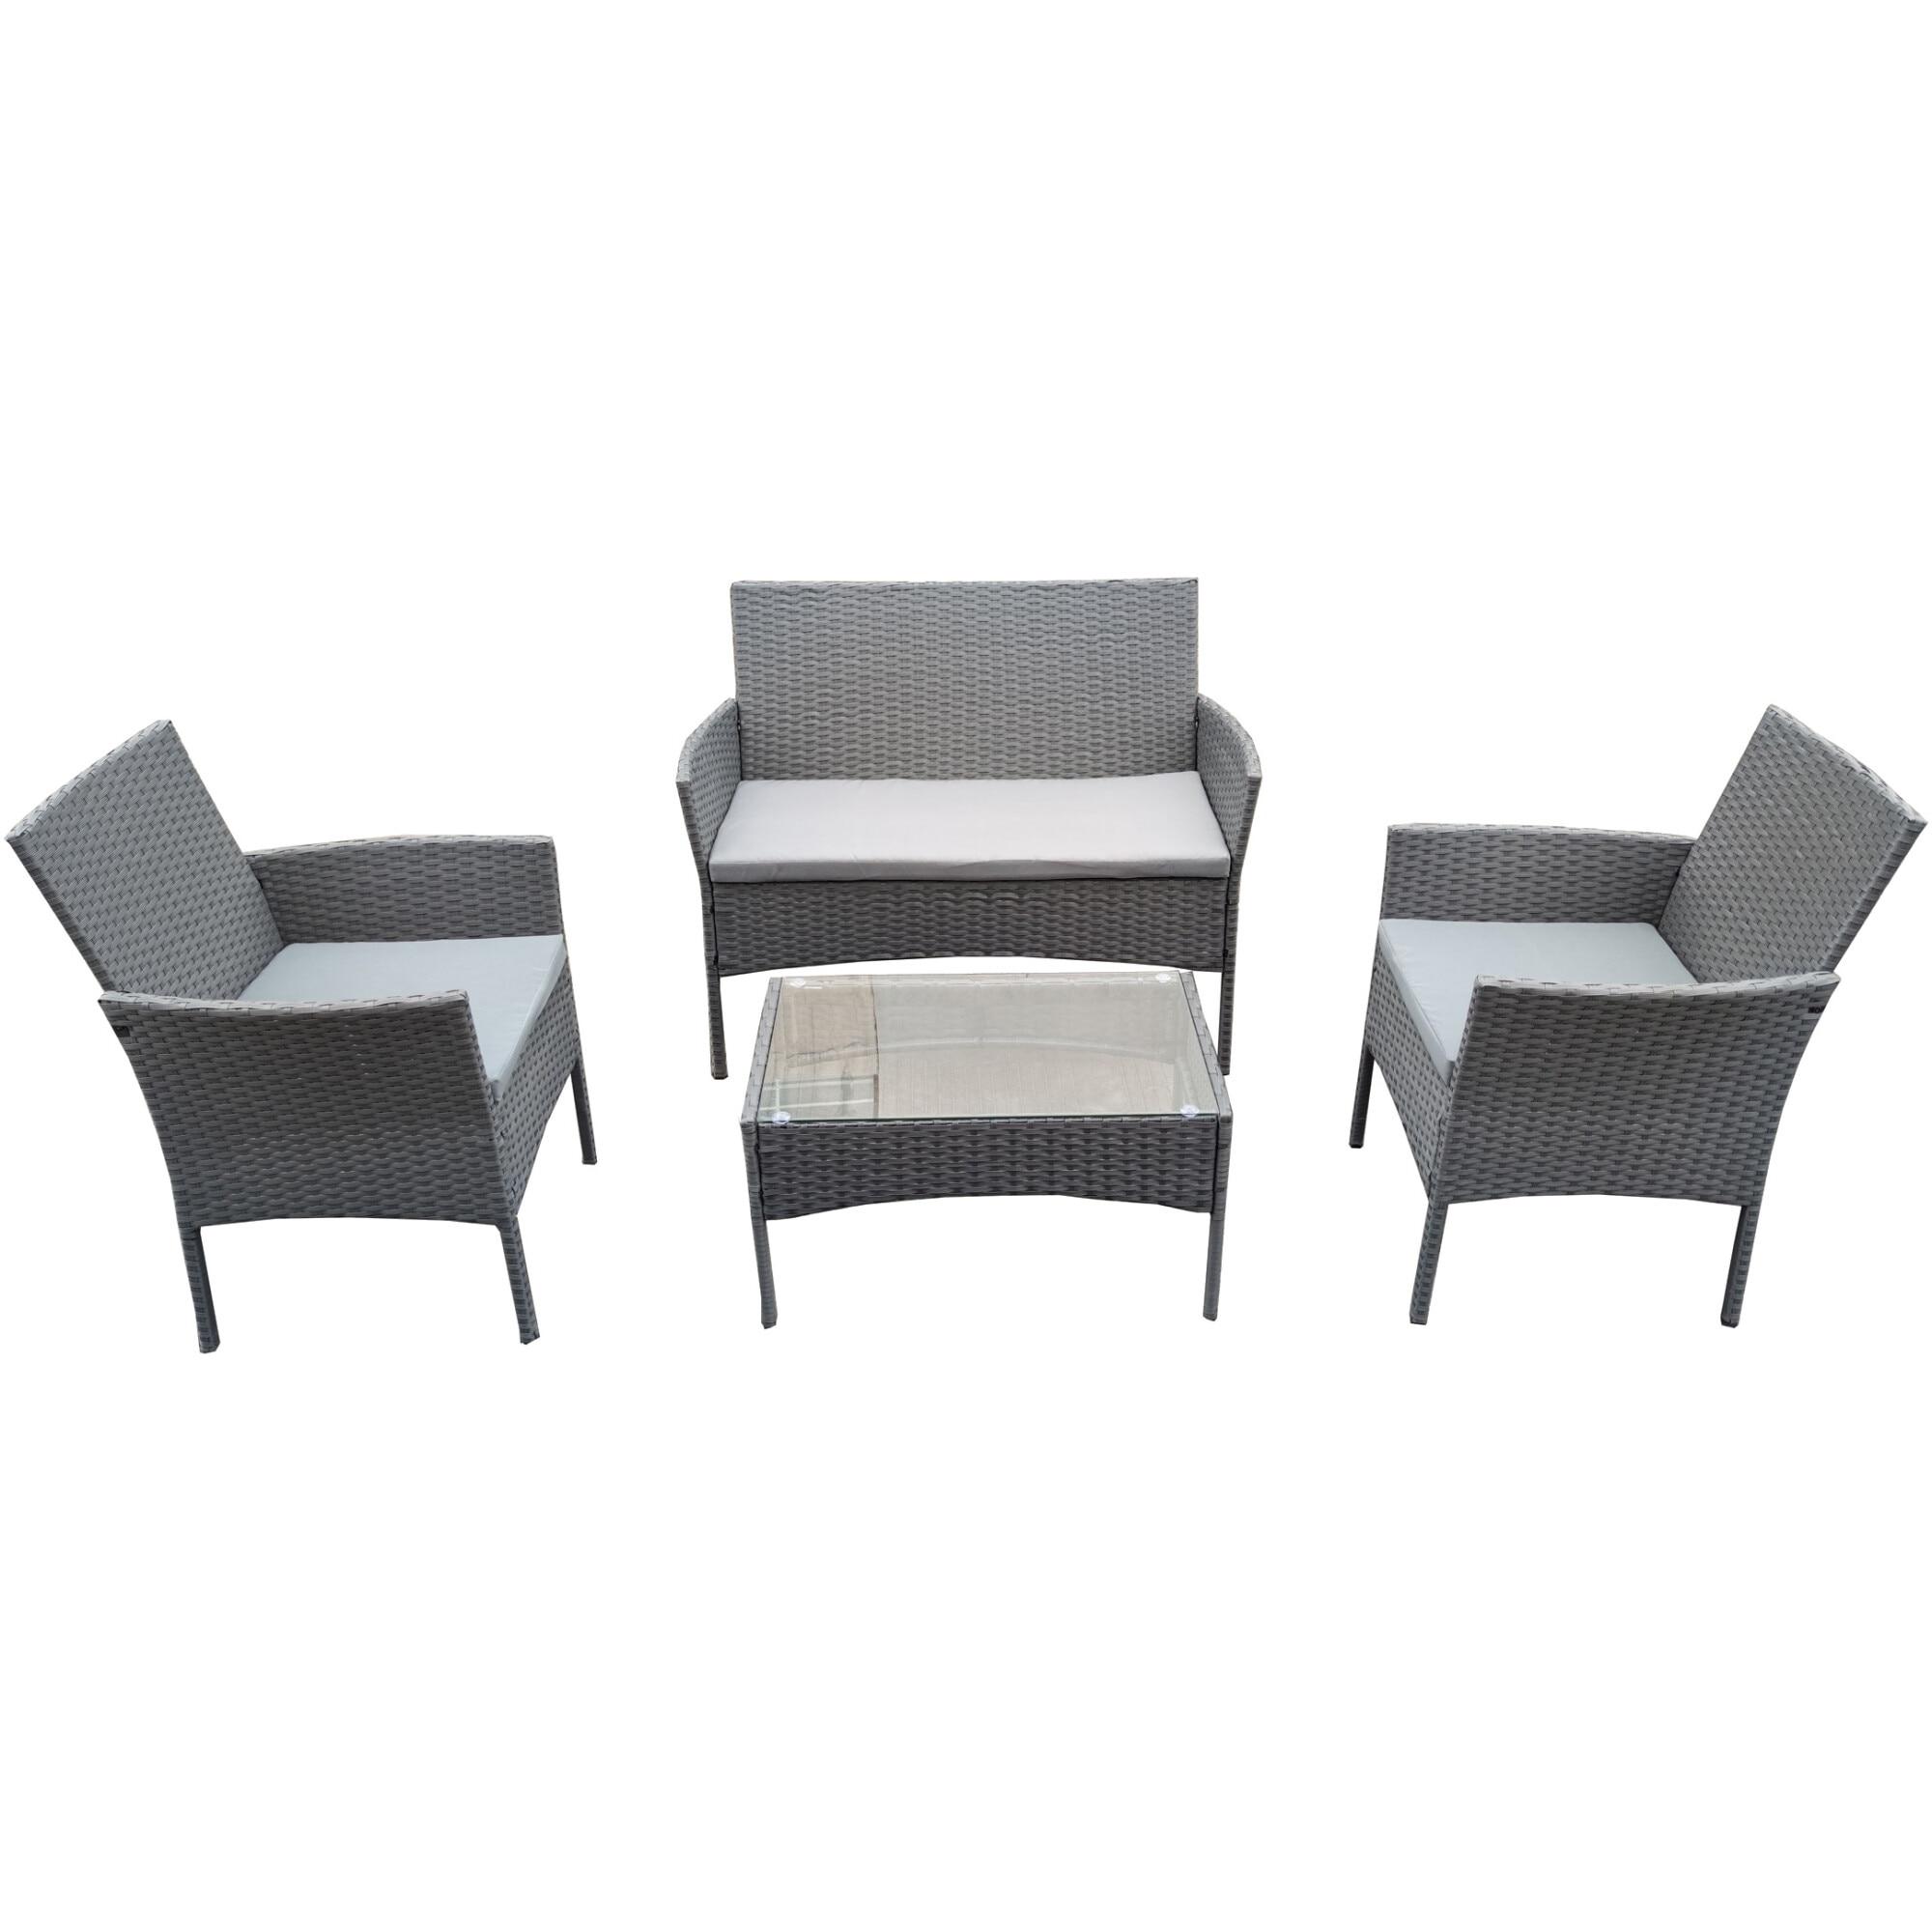 Fotografie Set mobilier gradina/terasa Kring Barkaro, masa, canapea, 2 fotolii,perne antracit